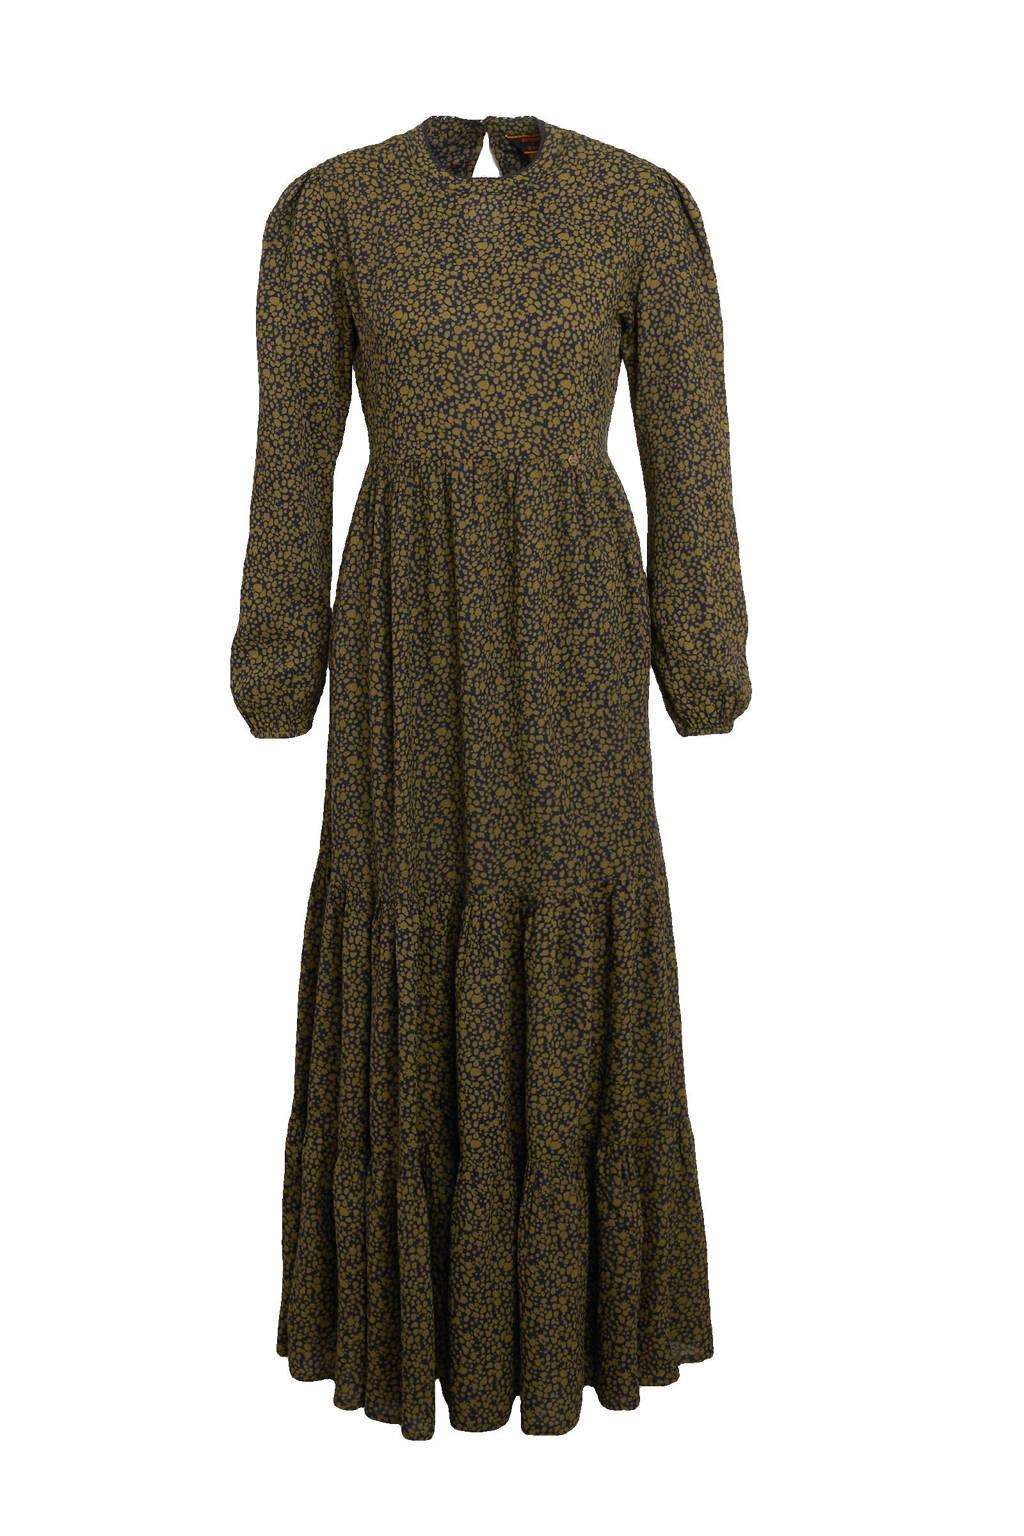 Superdry maxi jurk Skylar met dierenprint en kant leopard, Leopard